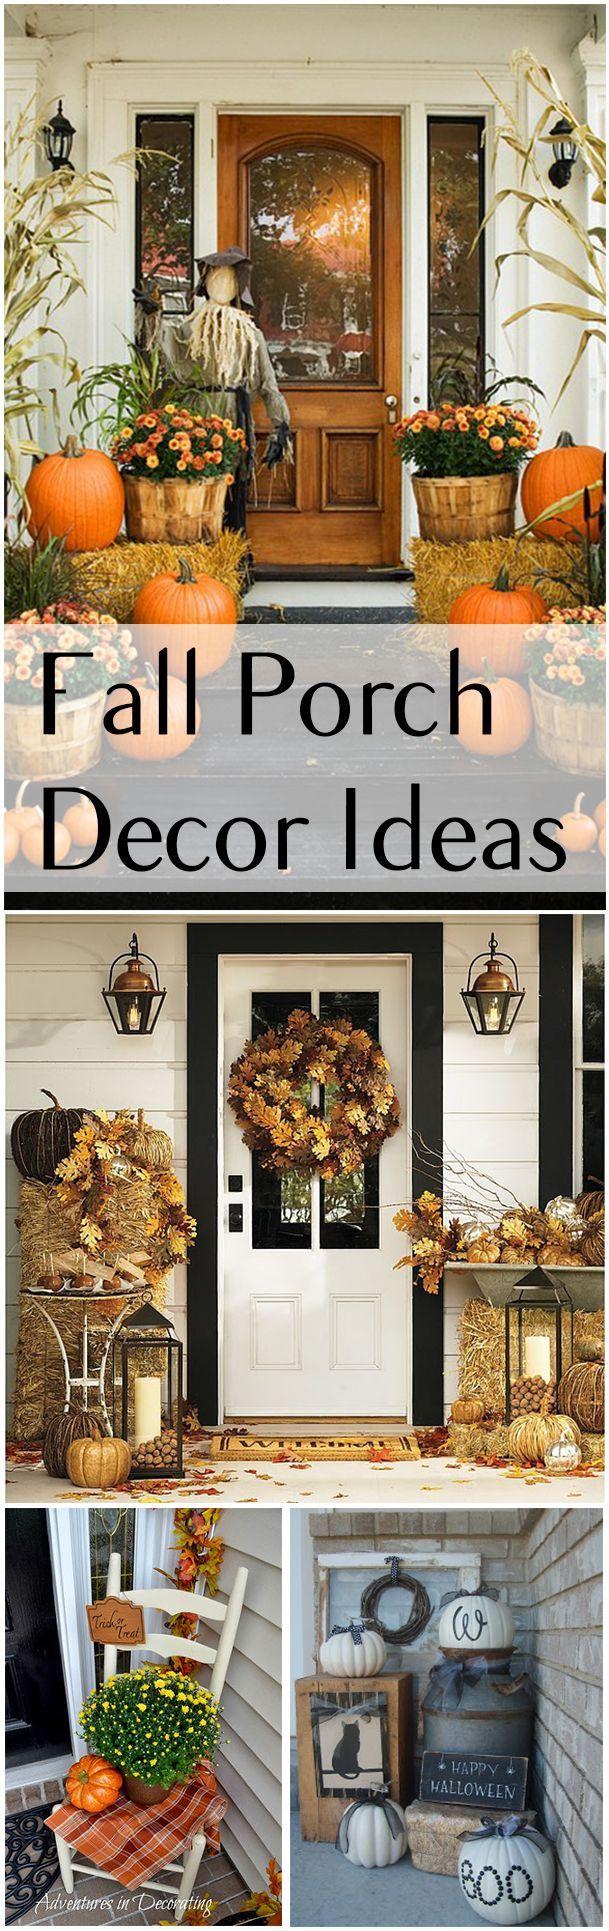 Fall Porch Decor Ideas Fall Decorations Porch Fall Decor Fall Porch